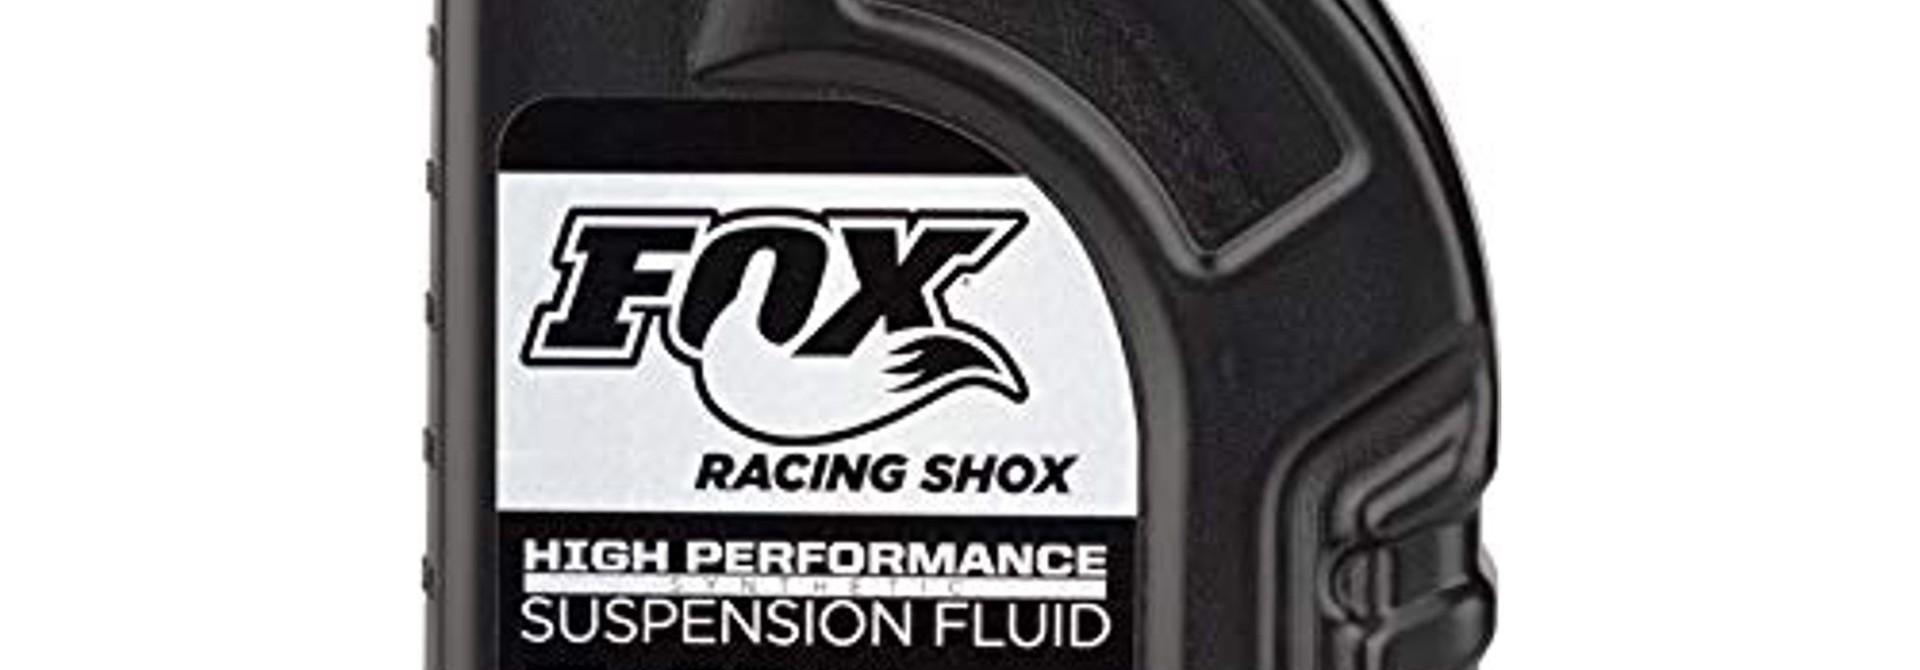 Fox High Performance Suspension Fluid 10 WT.